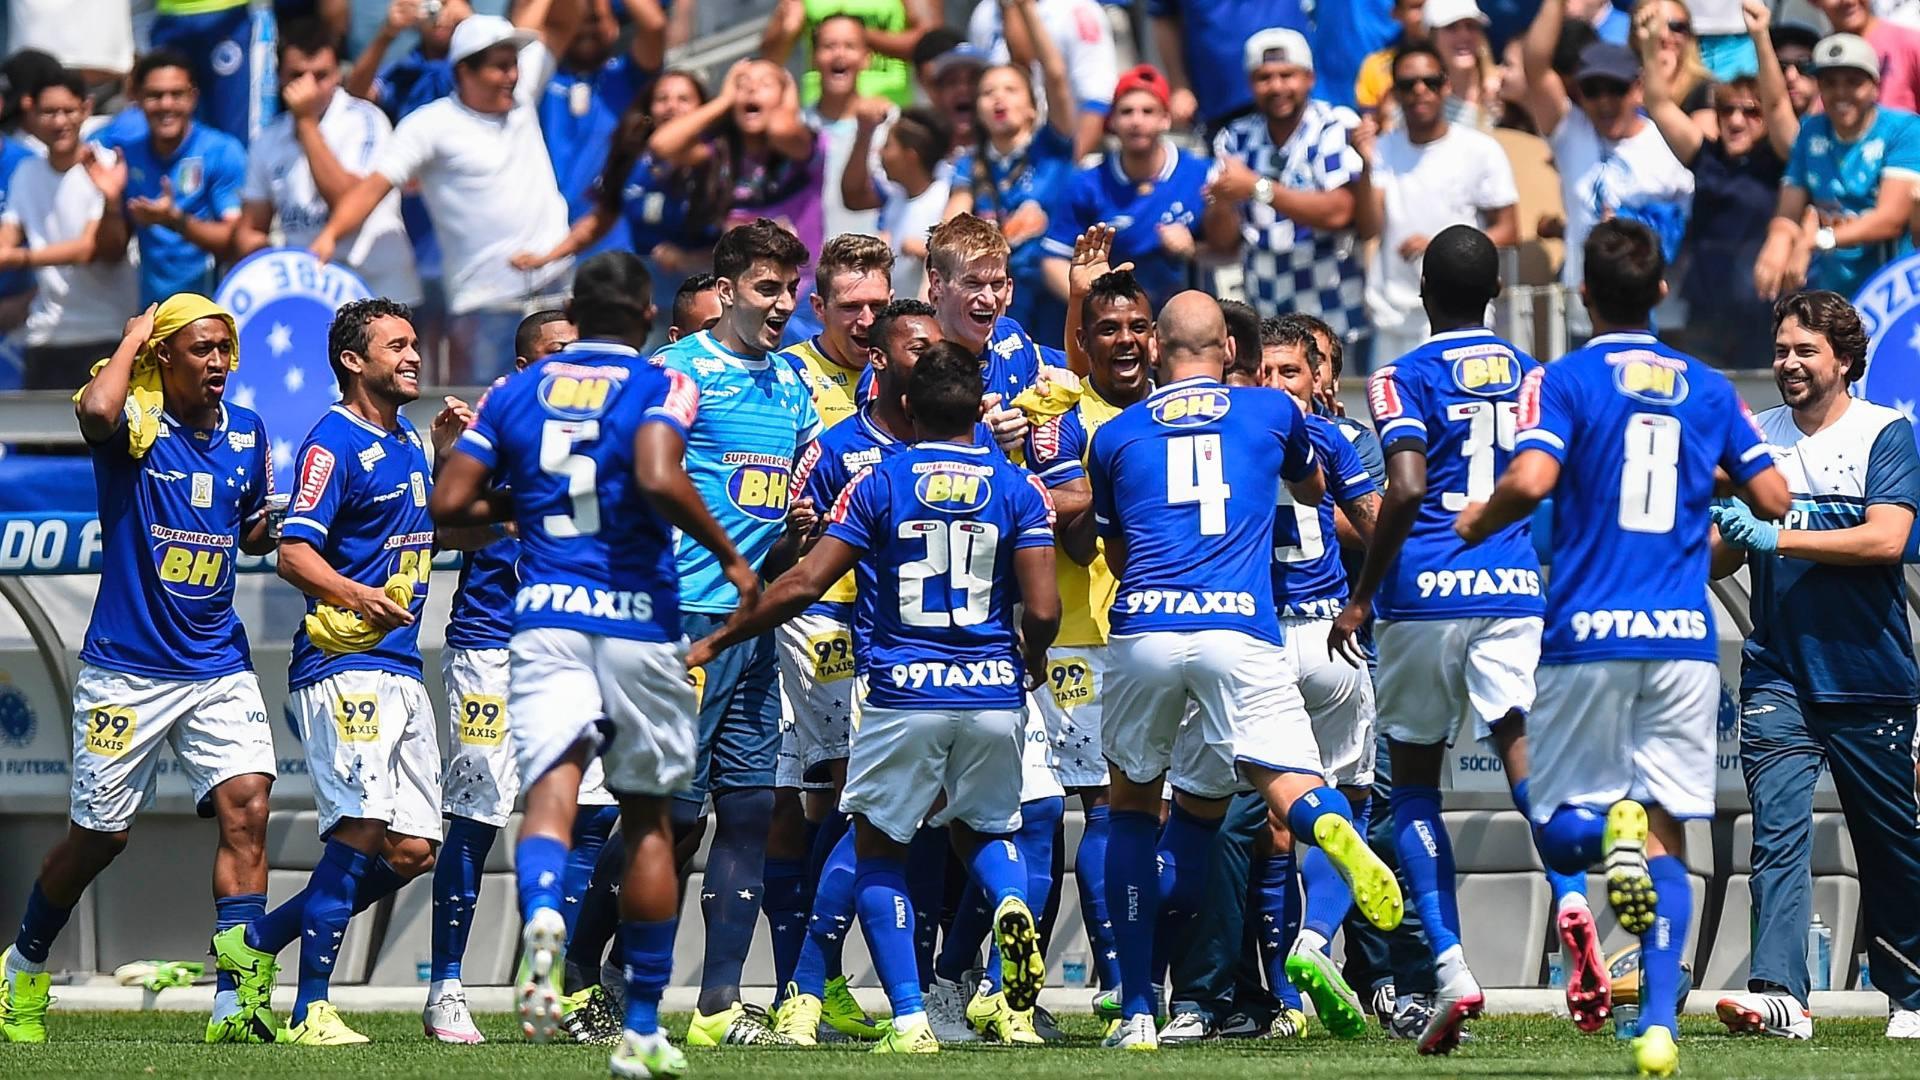 Cruzeiro Vitoria Maçı İddaa Tahmini 31.07.2017